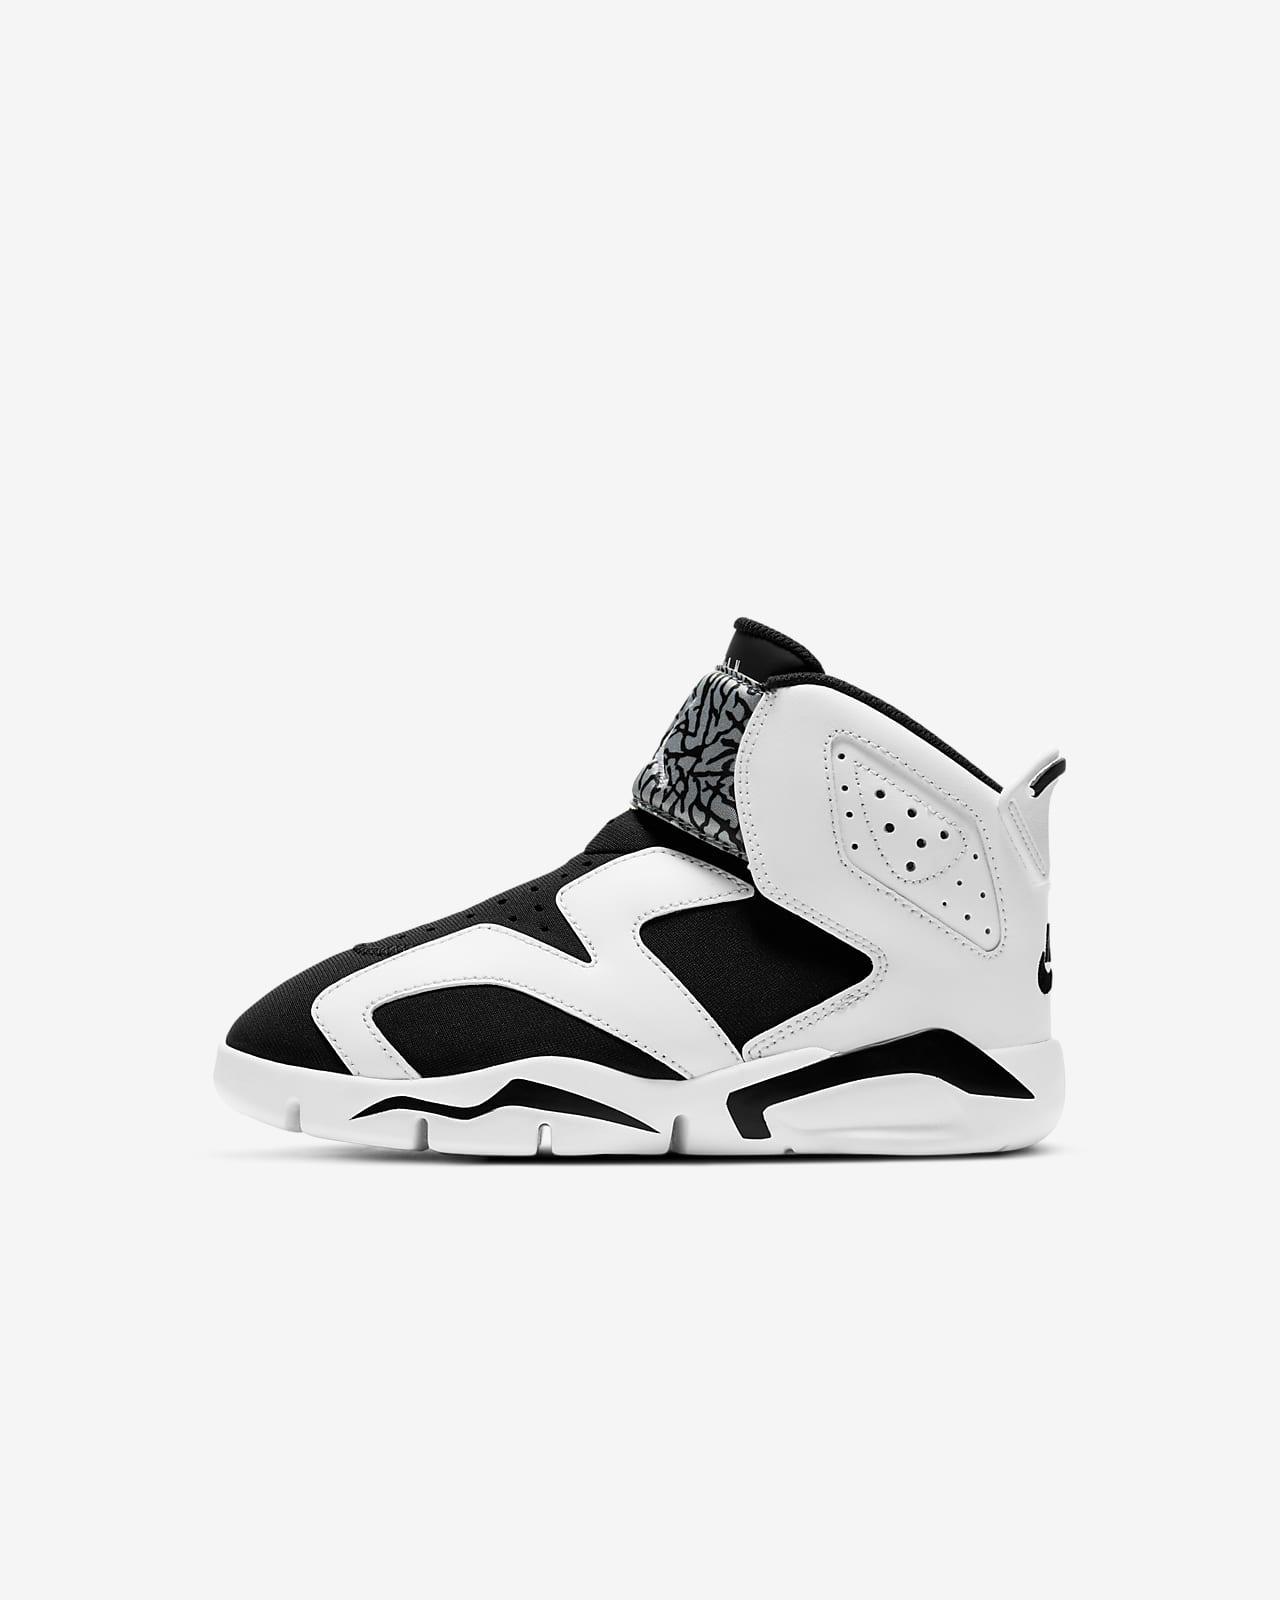 Jordan 6 Retro Little Flex 小童鞋款